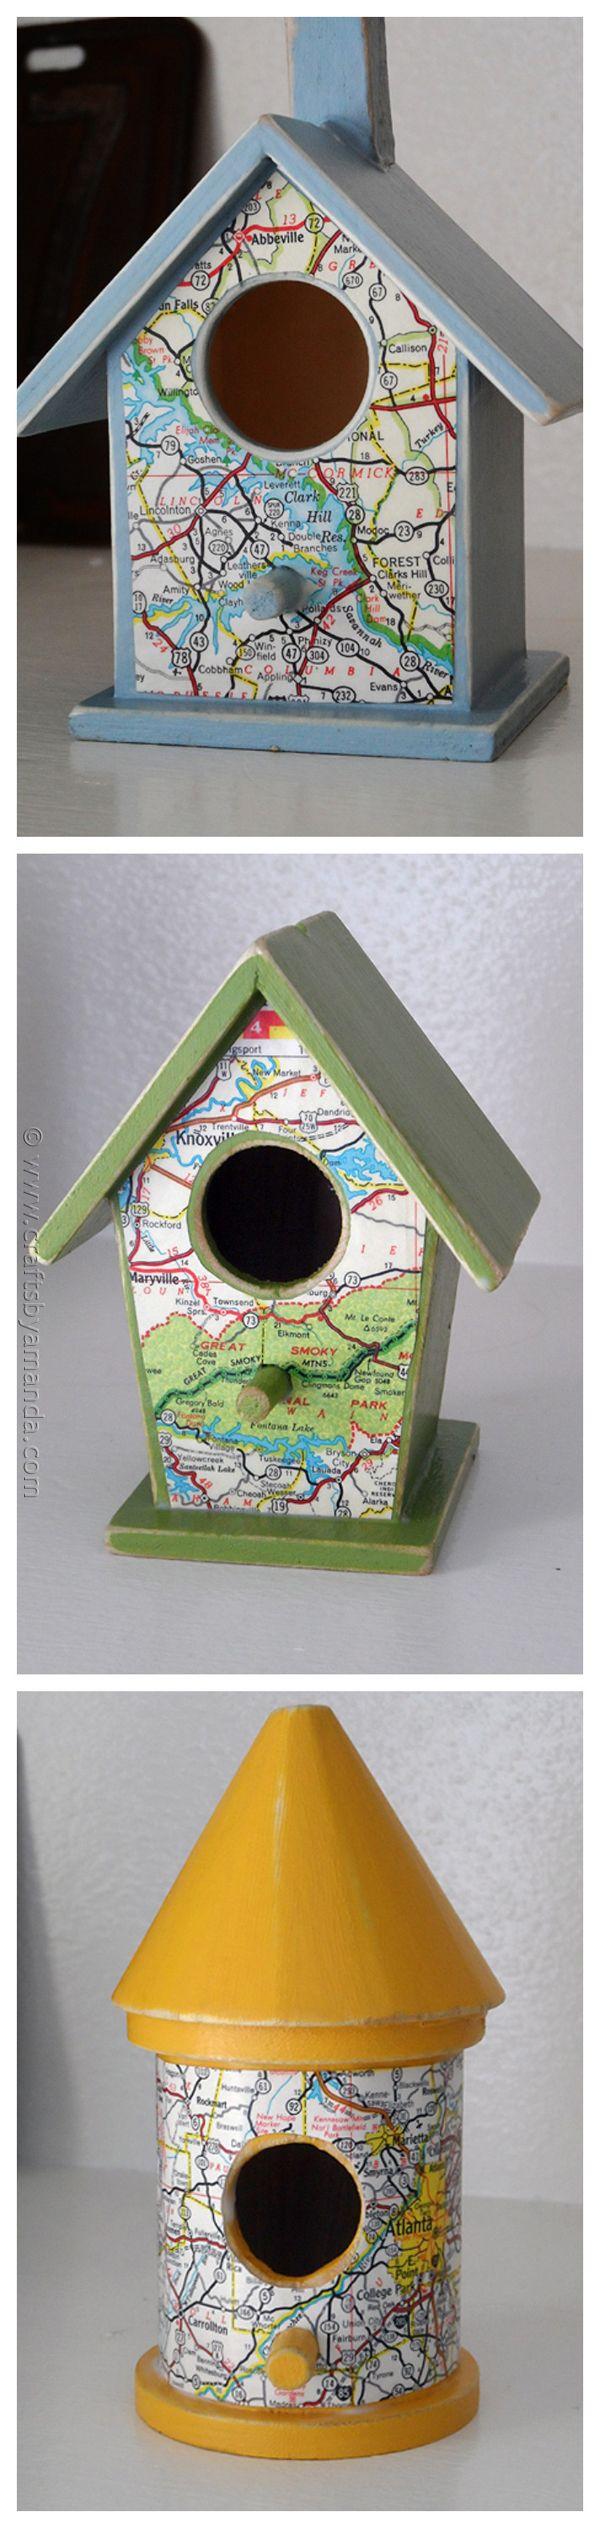 Road Map Birdhouses from CraftsbyAmanda.com @Amanda Snelson Snelson Snelson Formaro